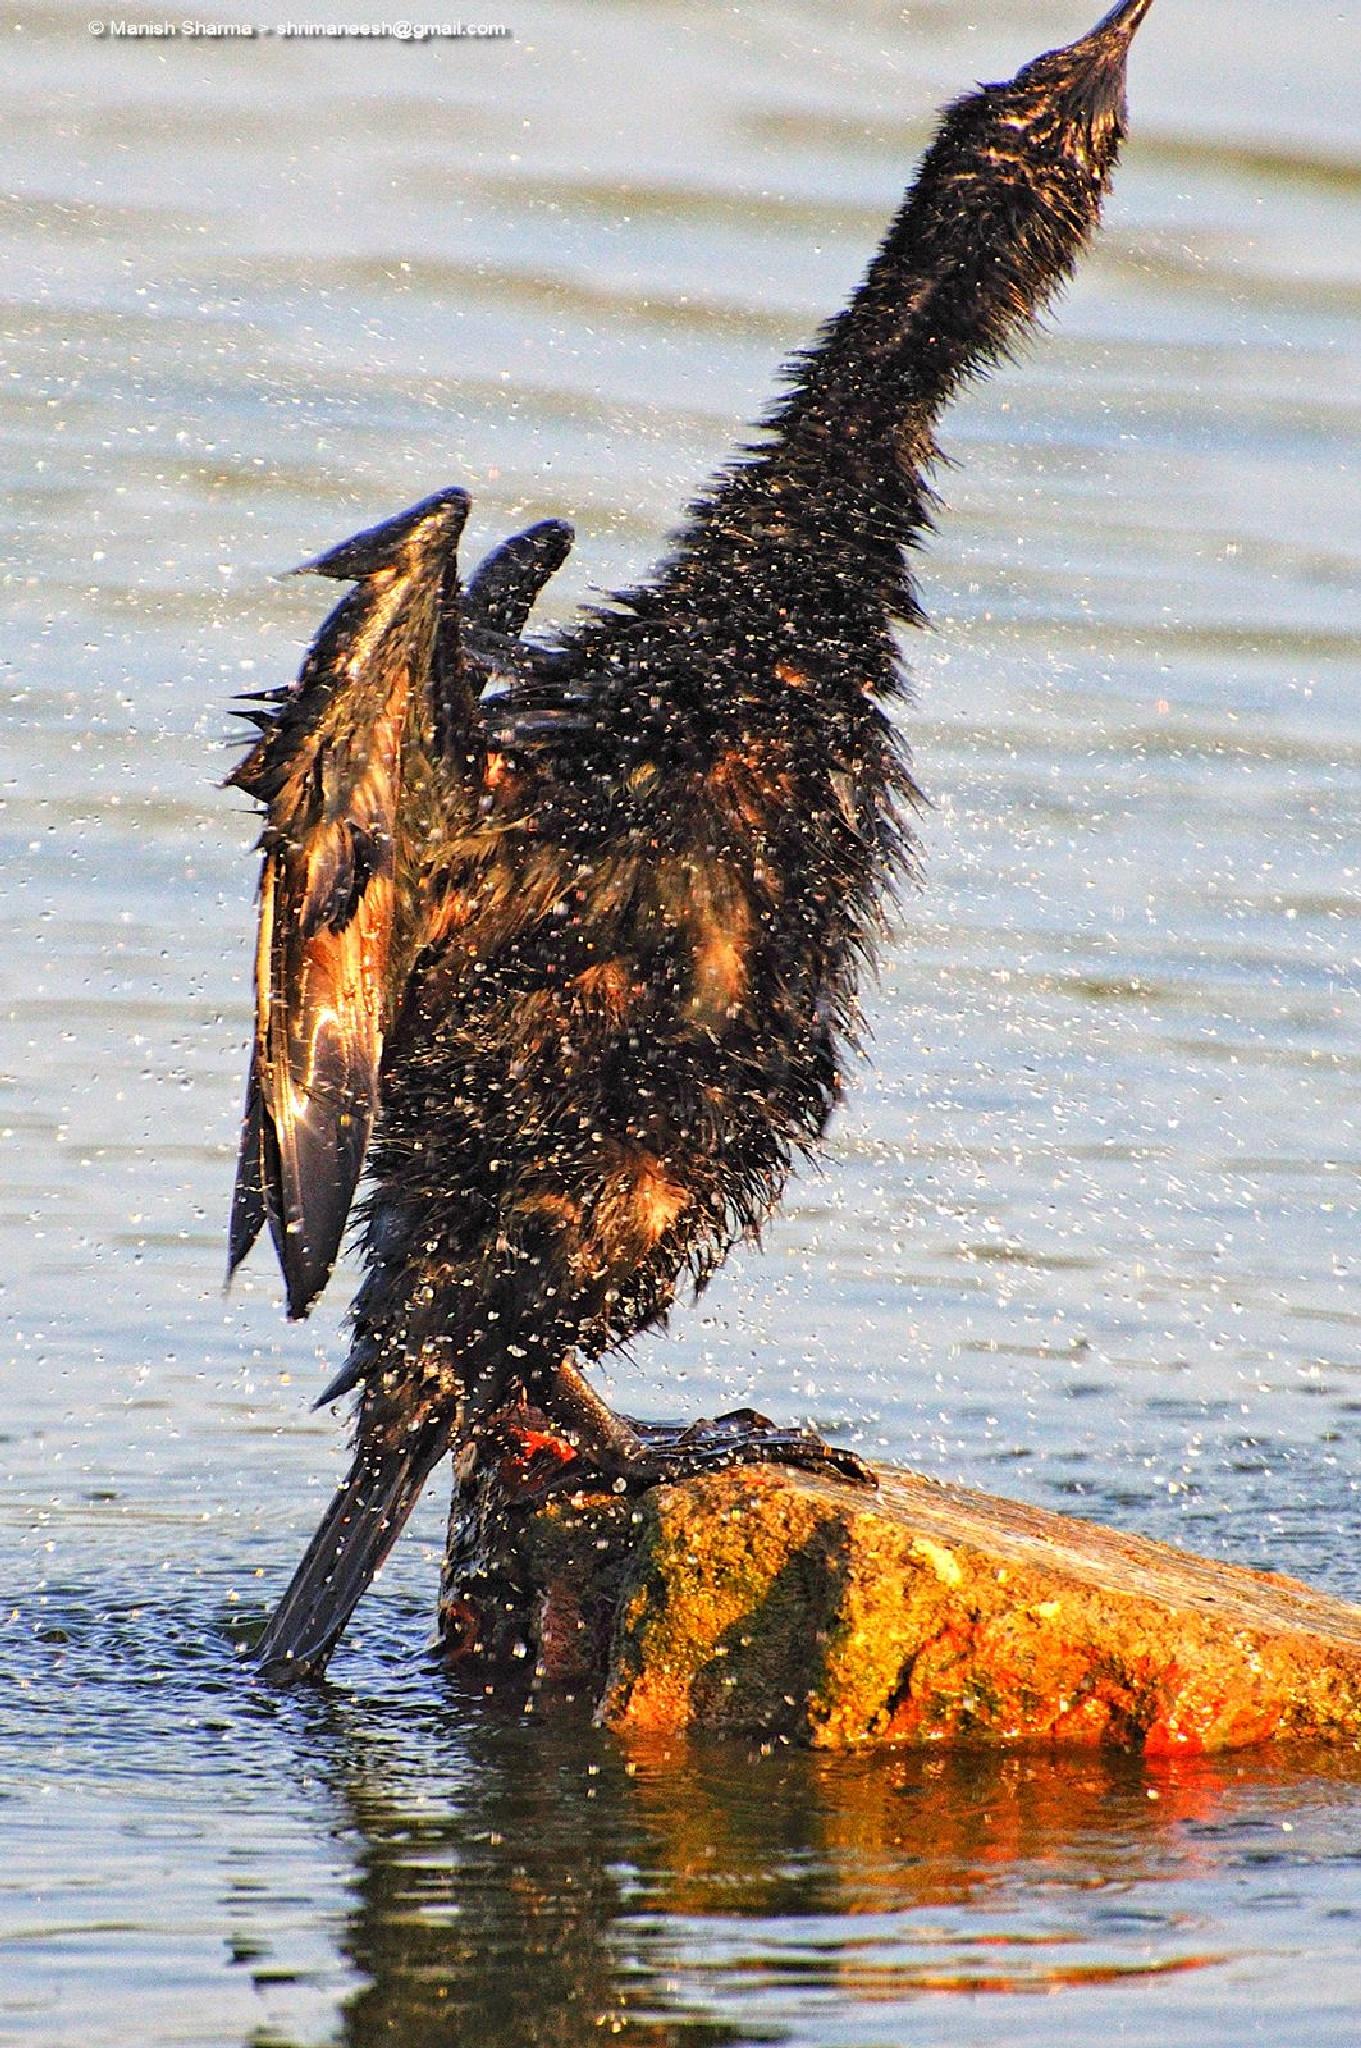 Little Black Cormorant by Maneesh Sharma